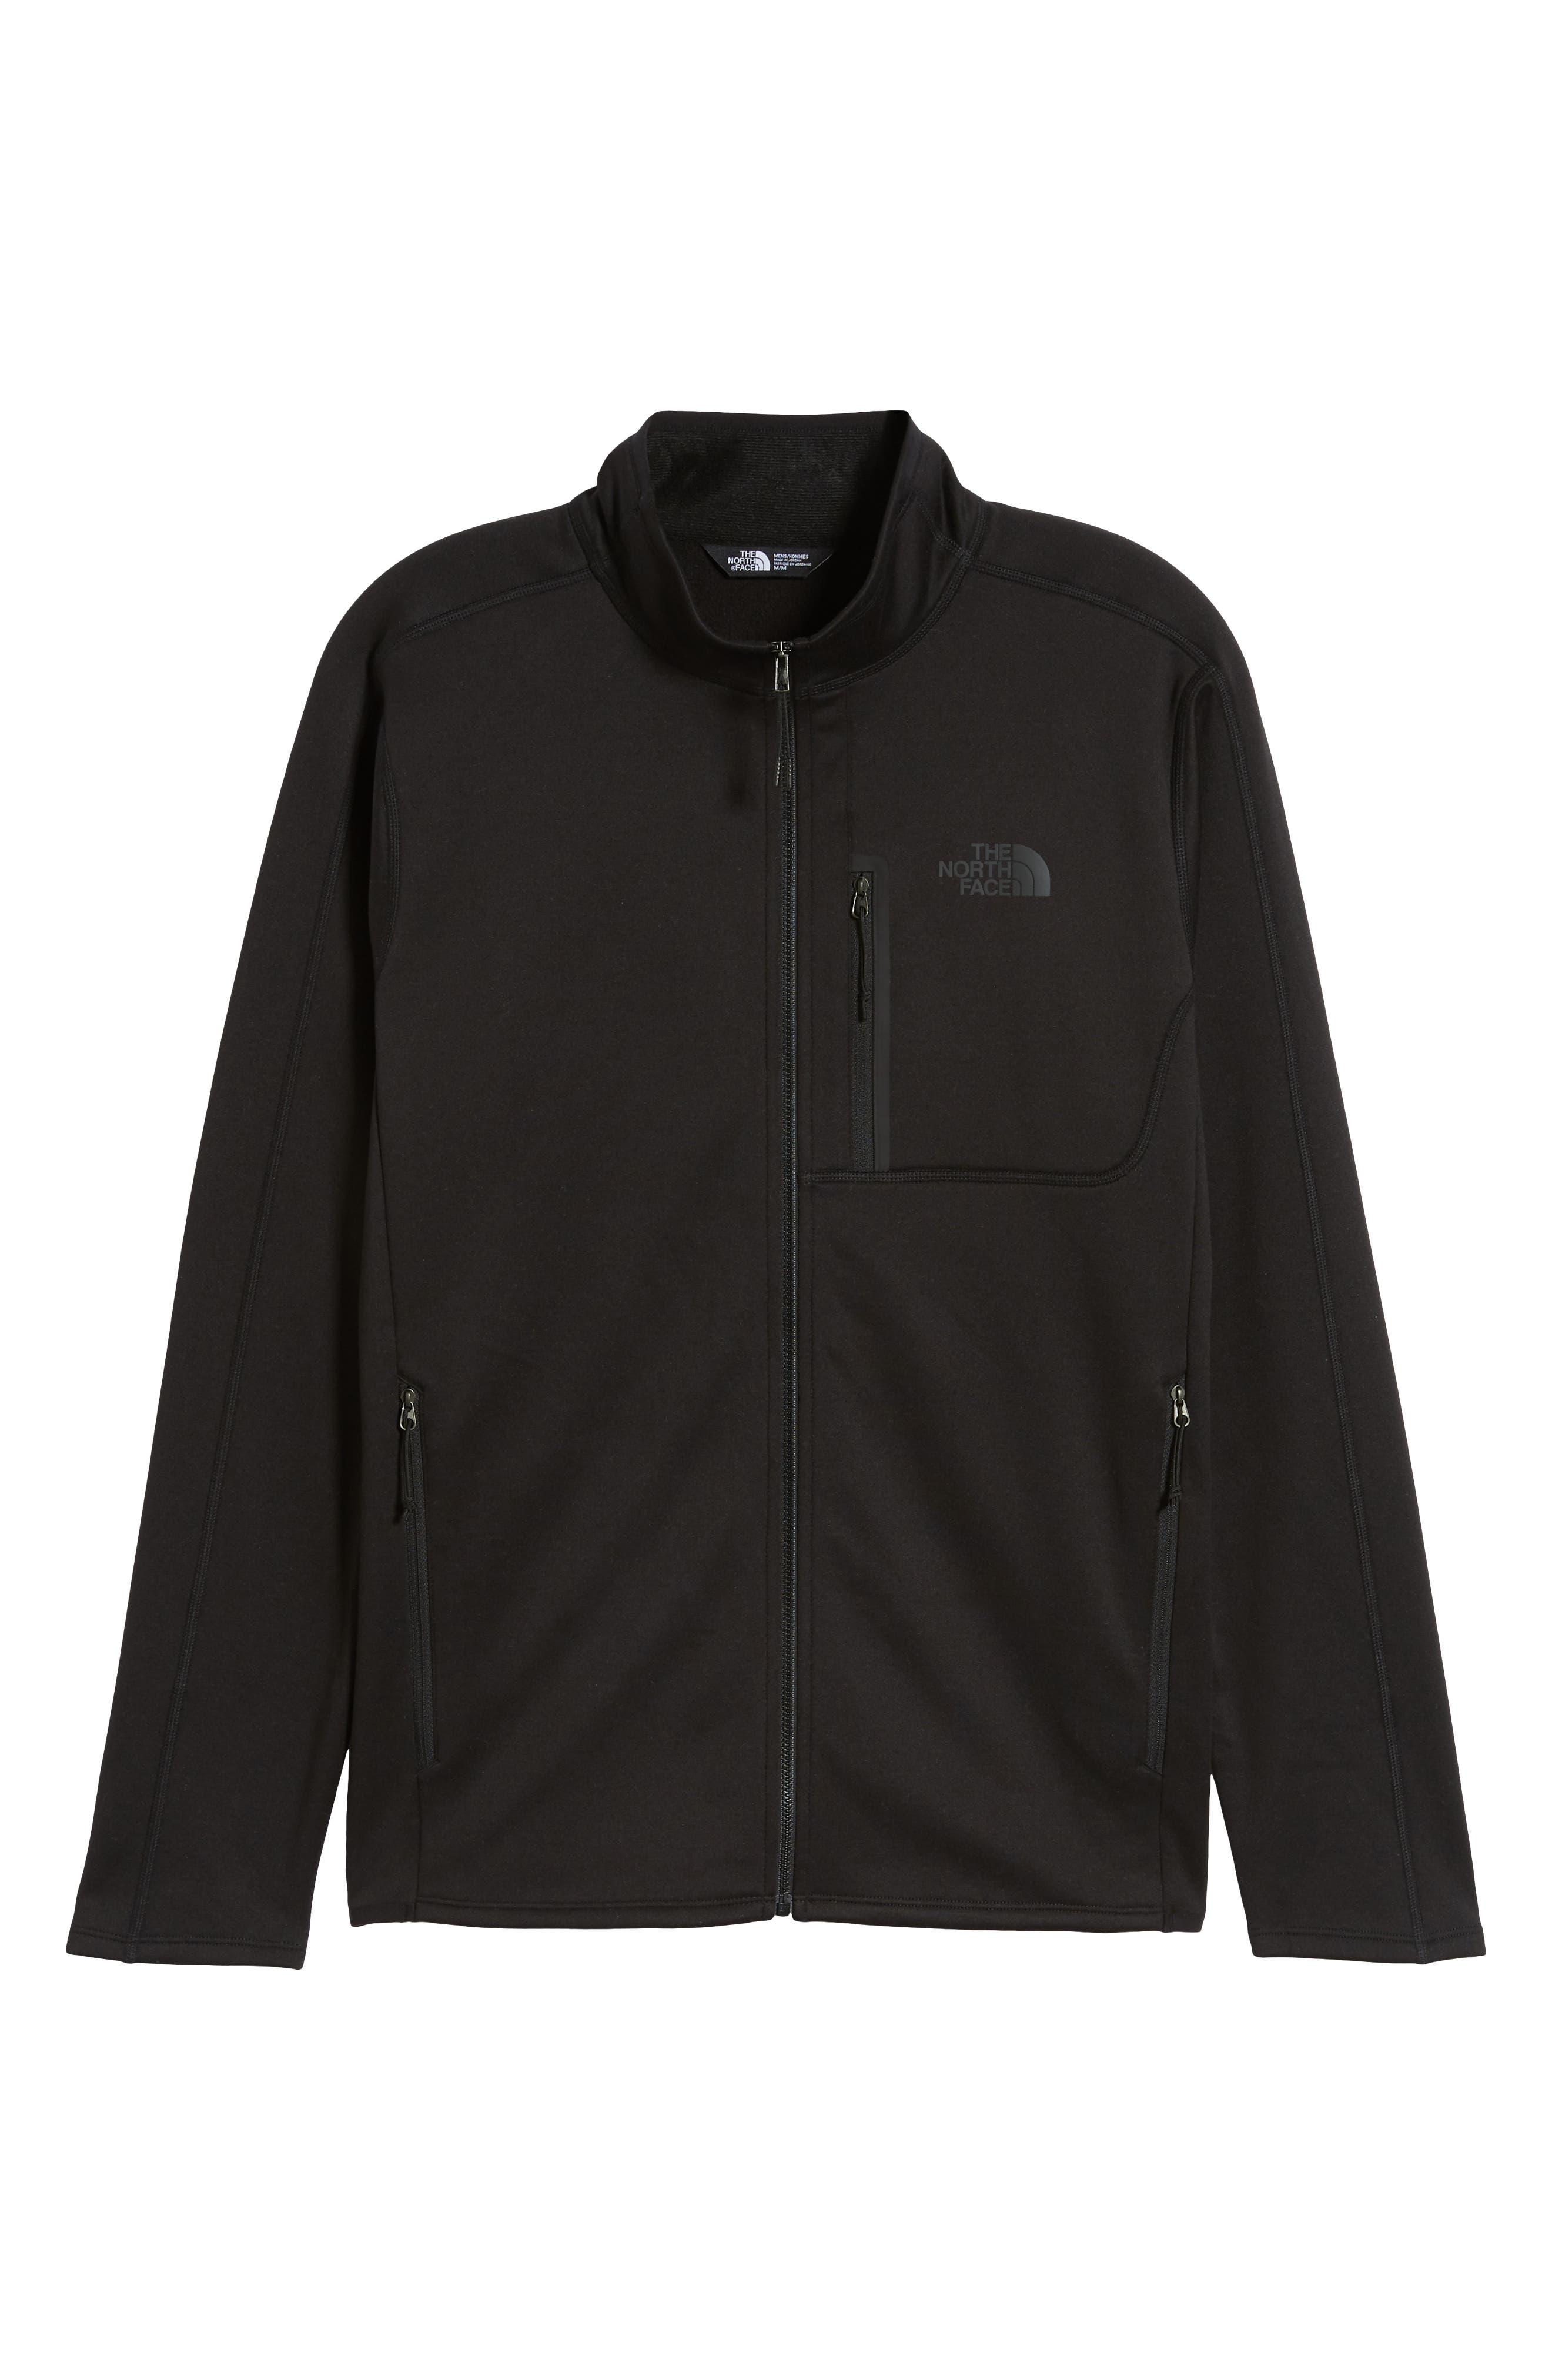 THE NORTH FACE,                             Canyonlands Zip Jacket,                             Alternate thumbnail 6, color,                             TNF BLACK